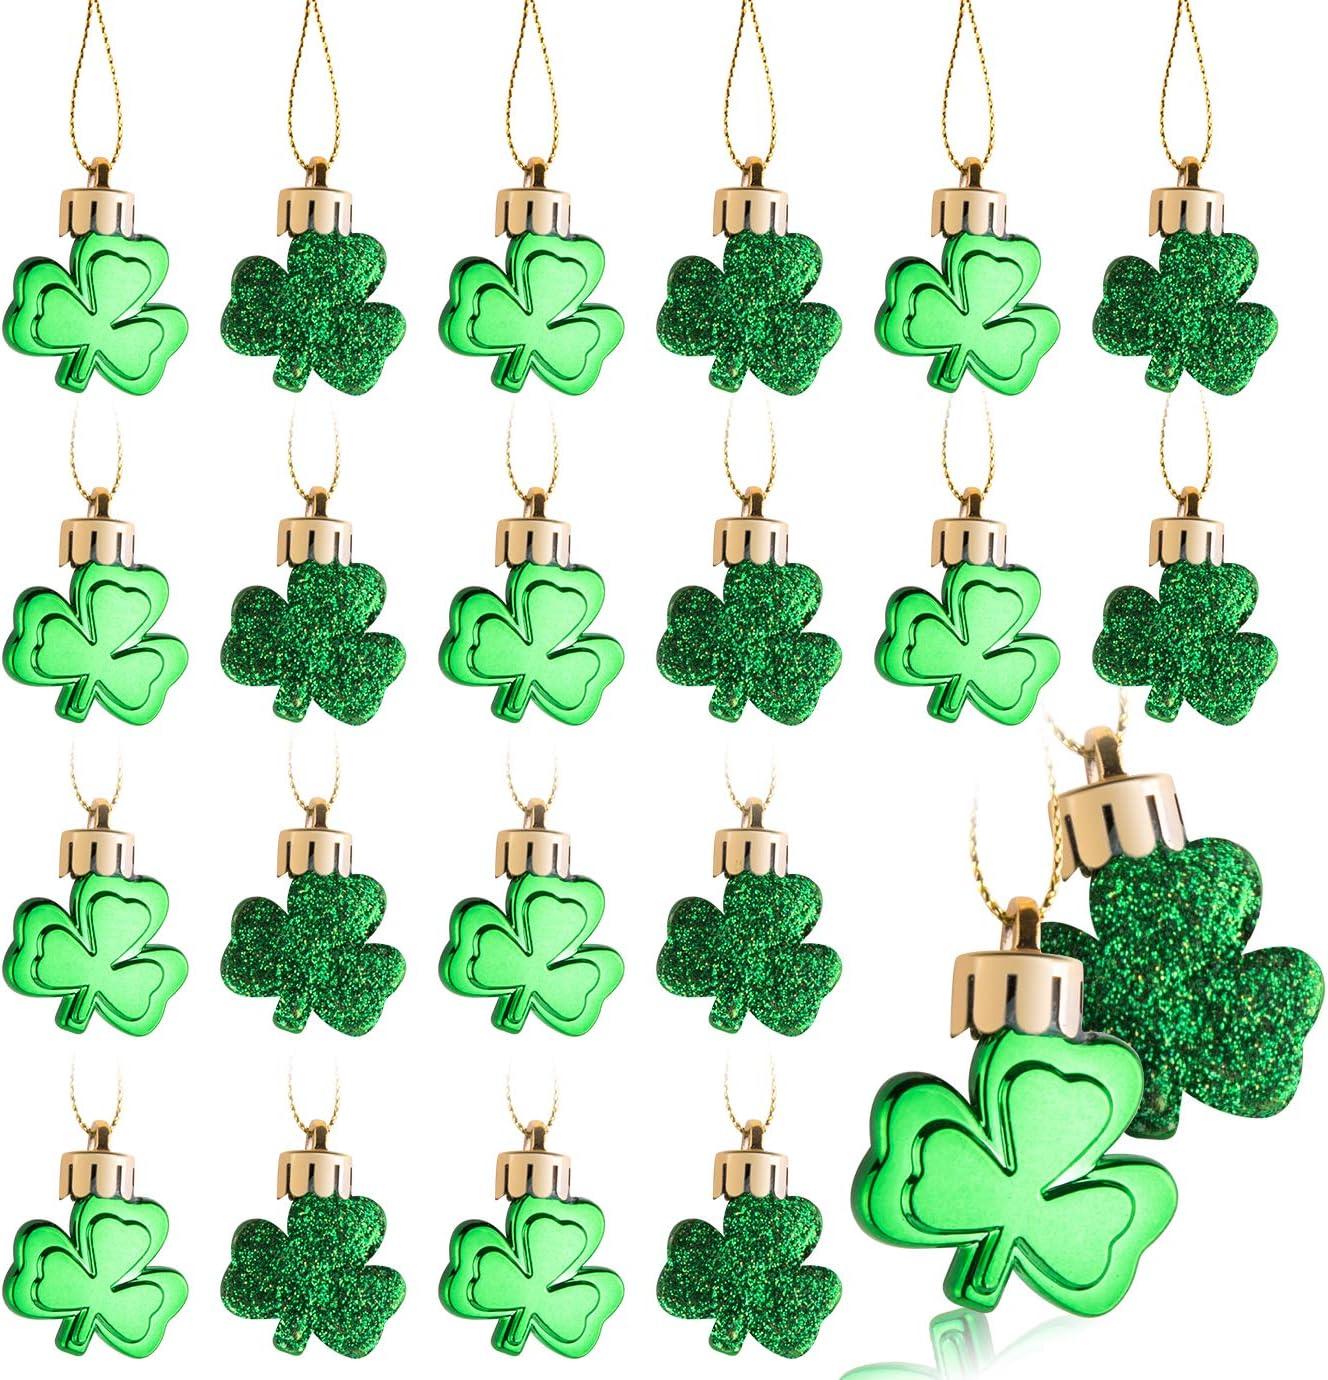 Patricks Day Decorations Gift HevenJx Shamrock St Patricks Day Ornaments Ceramic Hanging Ornaments Pendant for St